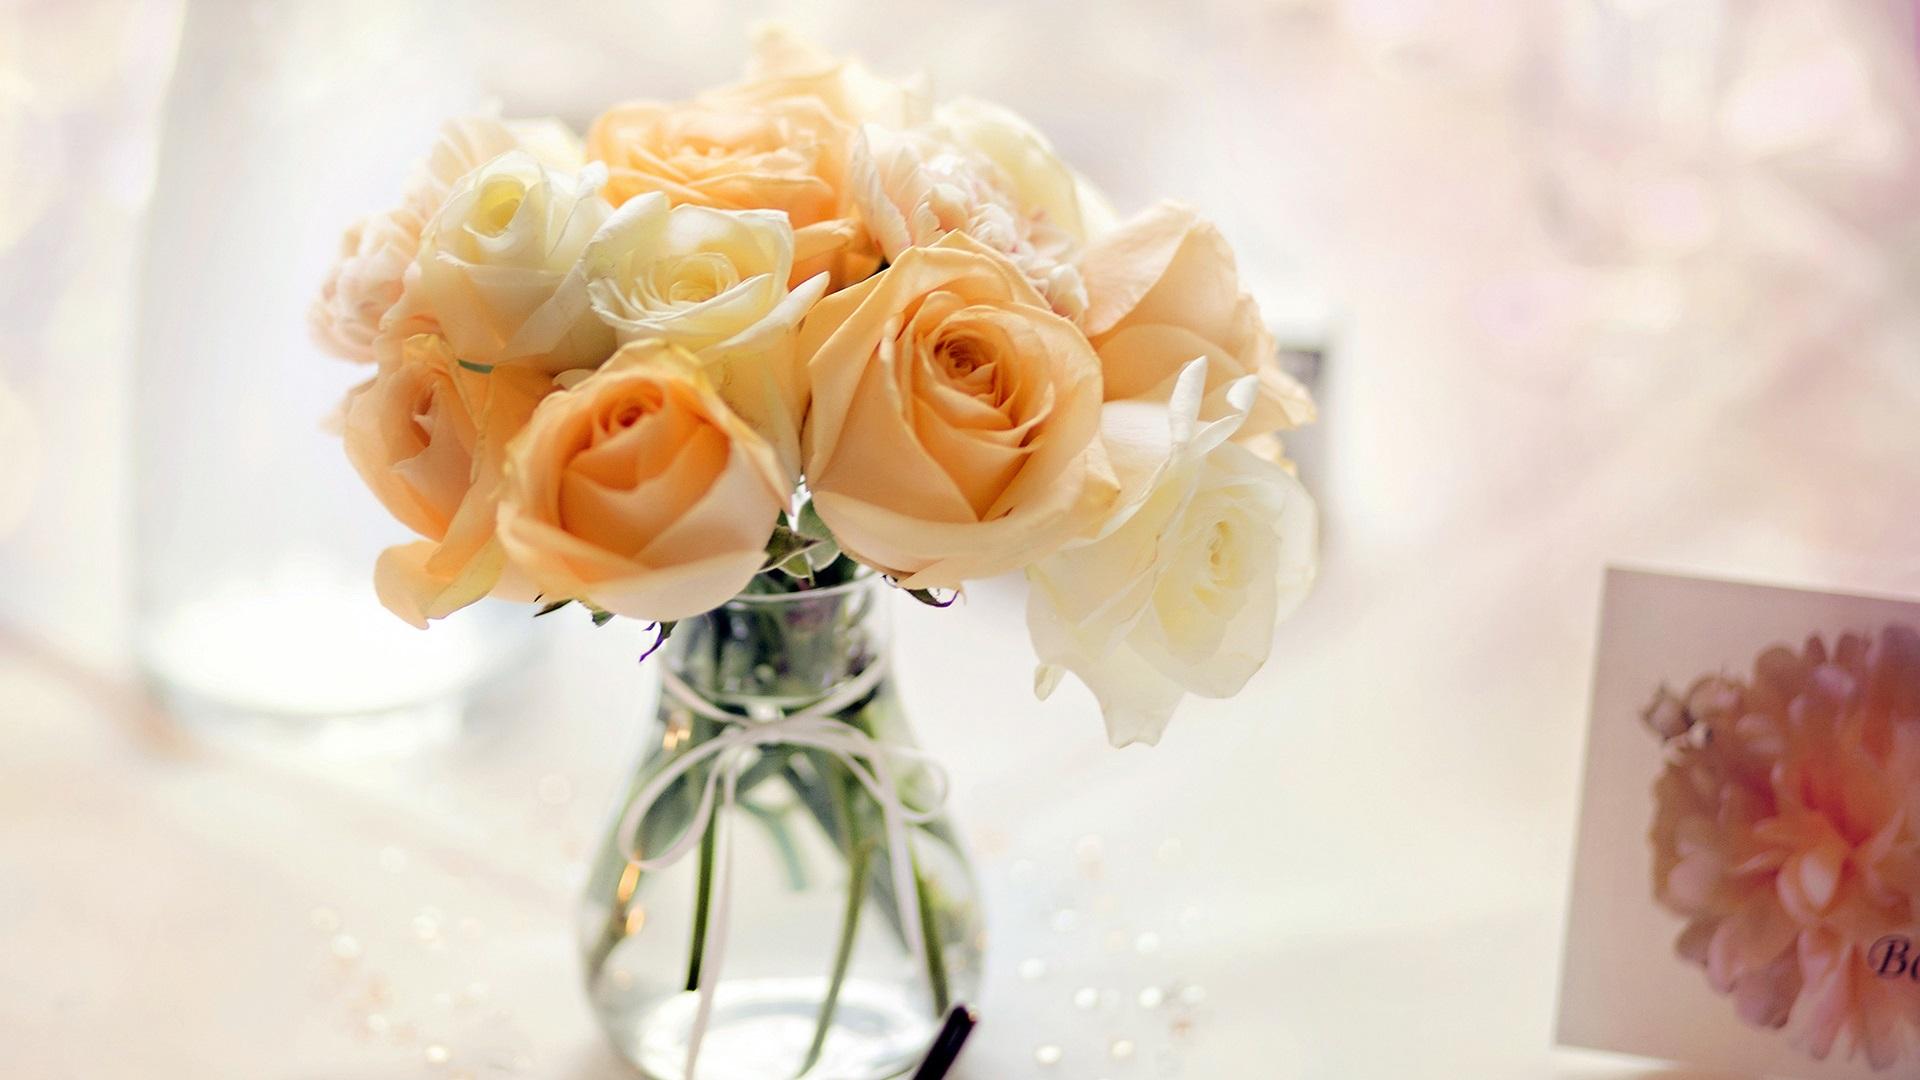 Yellow flowers, rose, vase, bouquet Wallpaper | 1920x1080 ...